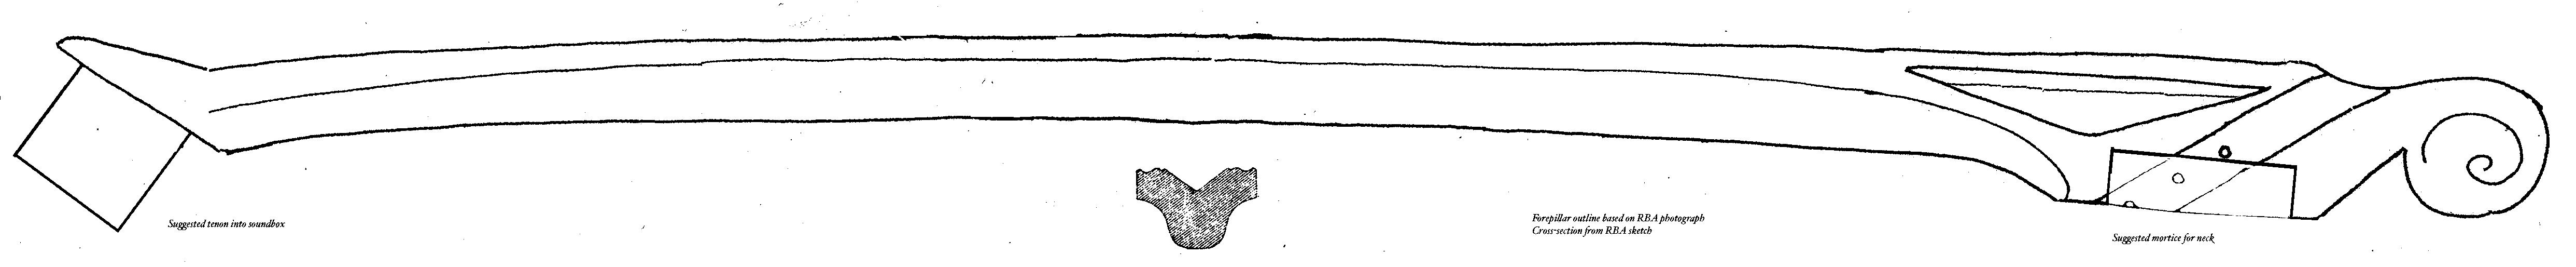 early gaelic harp info the emporium basic harp plans